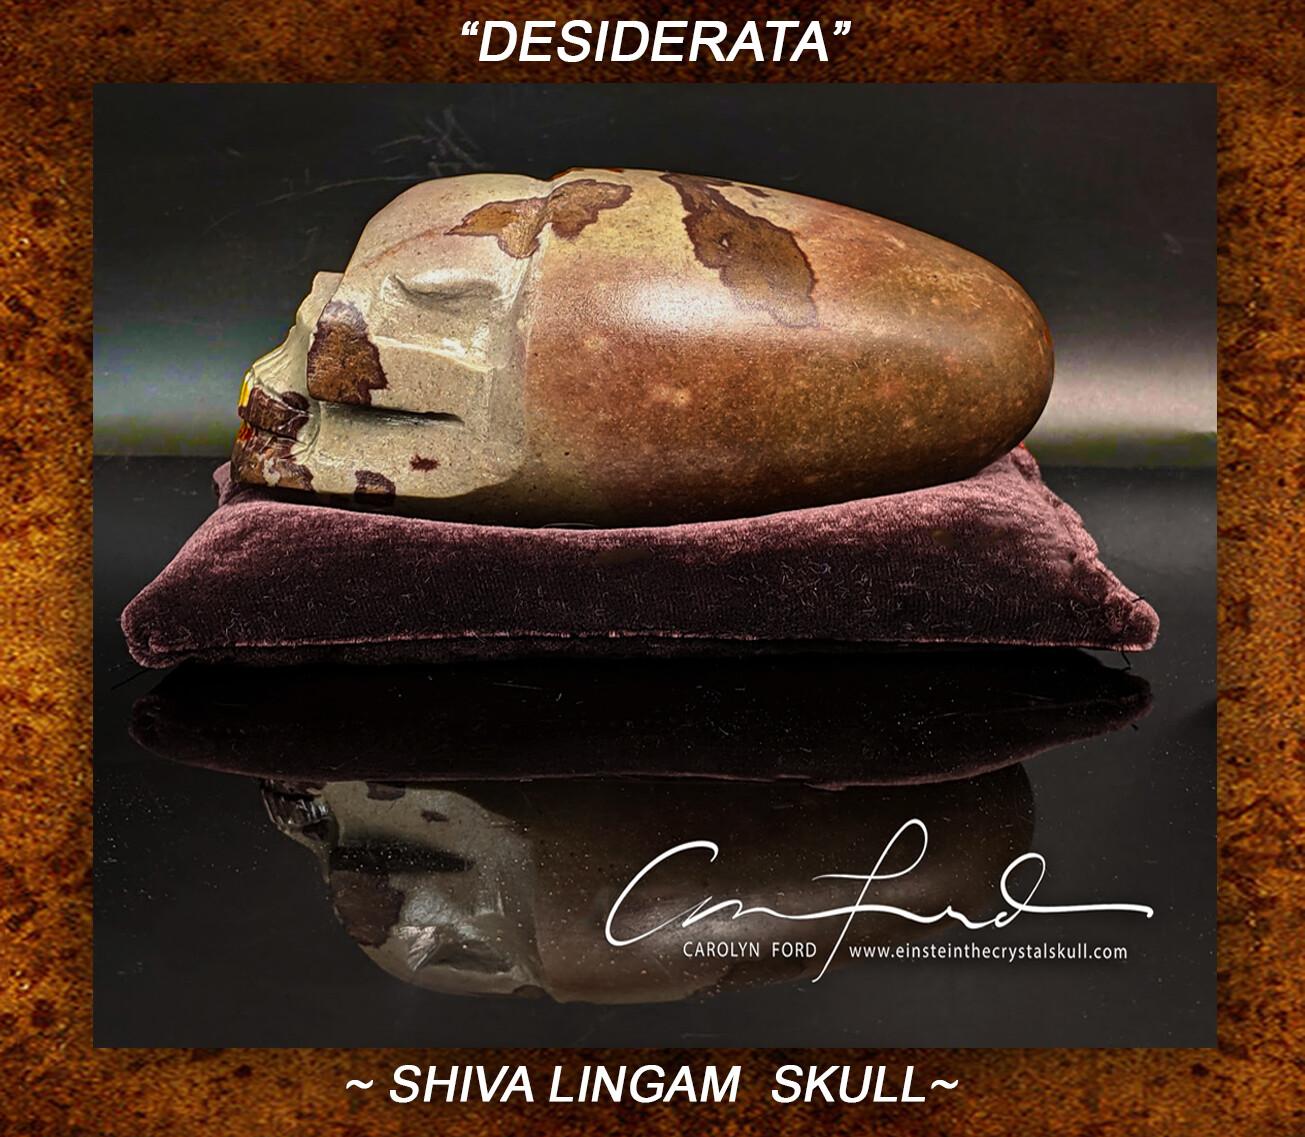 Shiva Lingam Skull,  Einstein the Ancient Crystal  Skull Imprinted